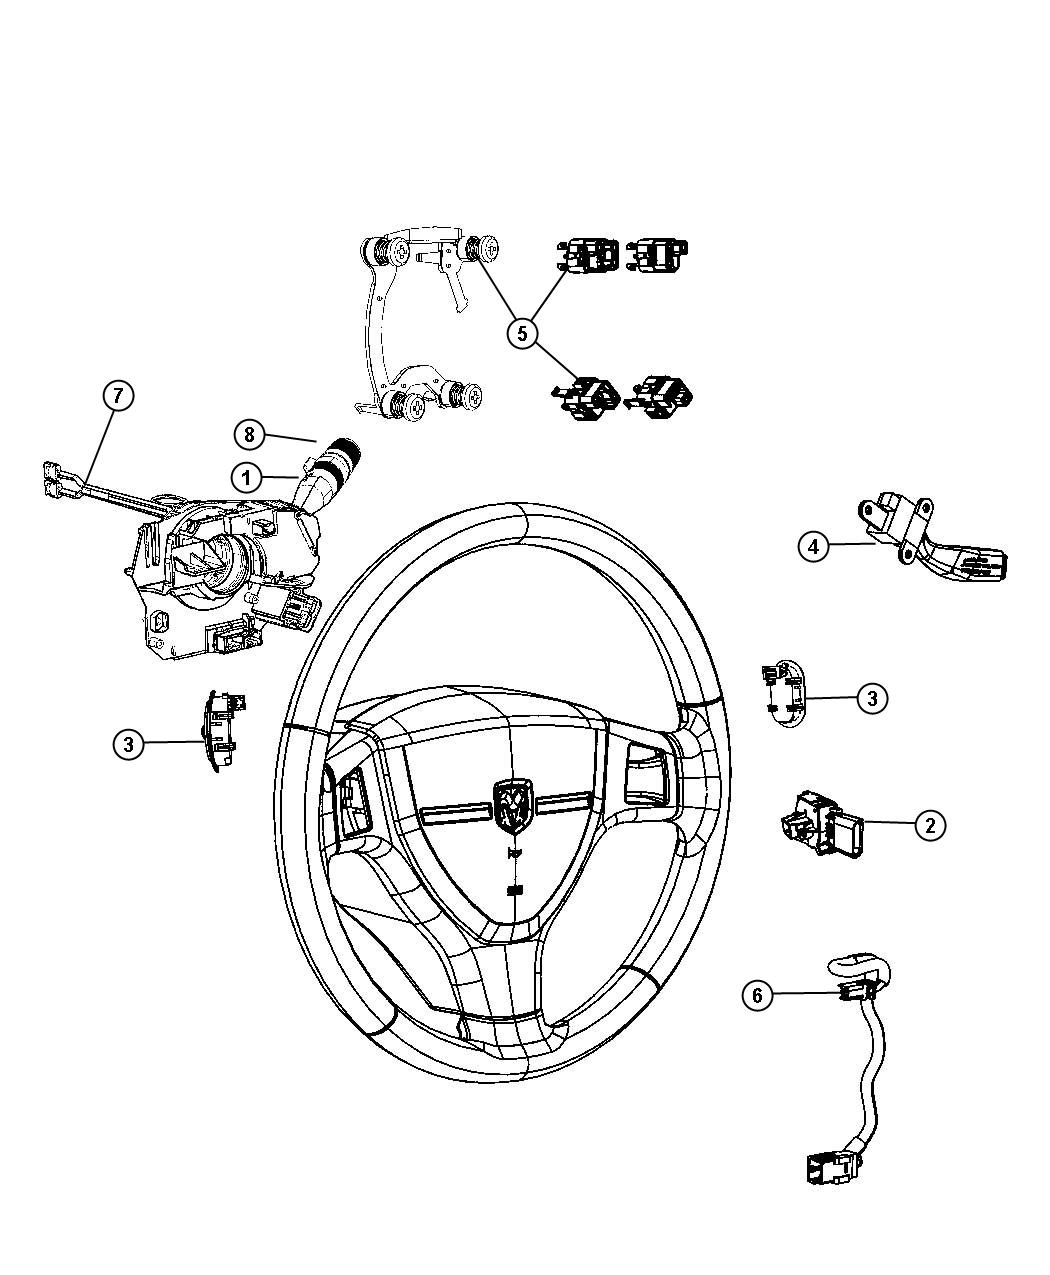 2007 dodge caliber horn wiring diagram pto 2009 switch scv nhm rdz after 08